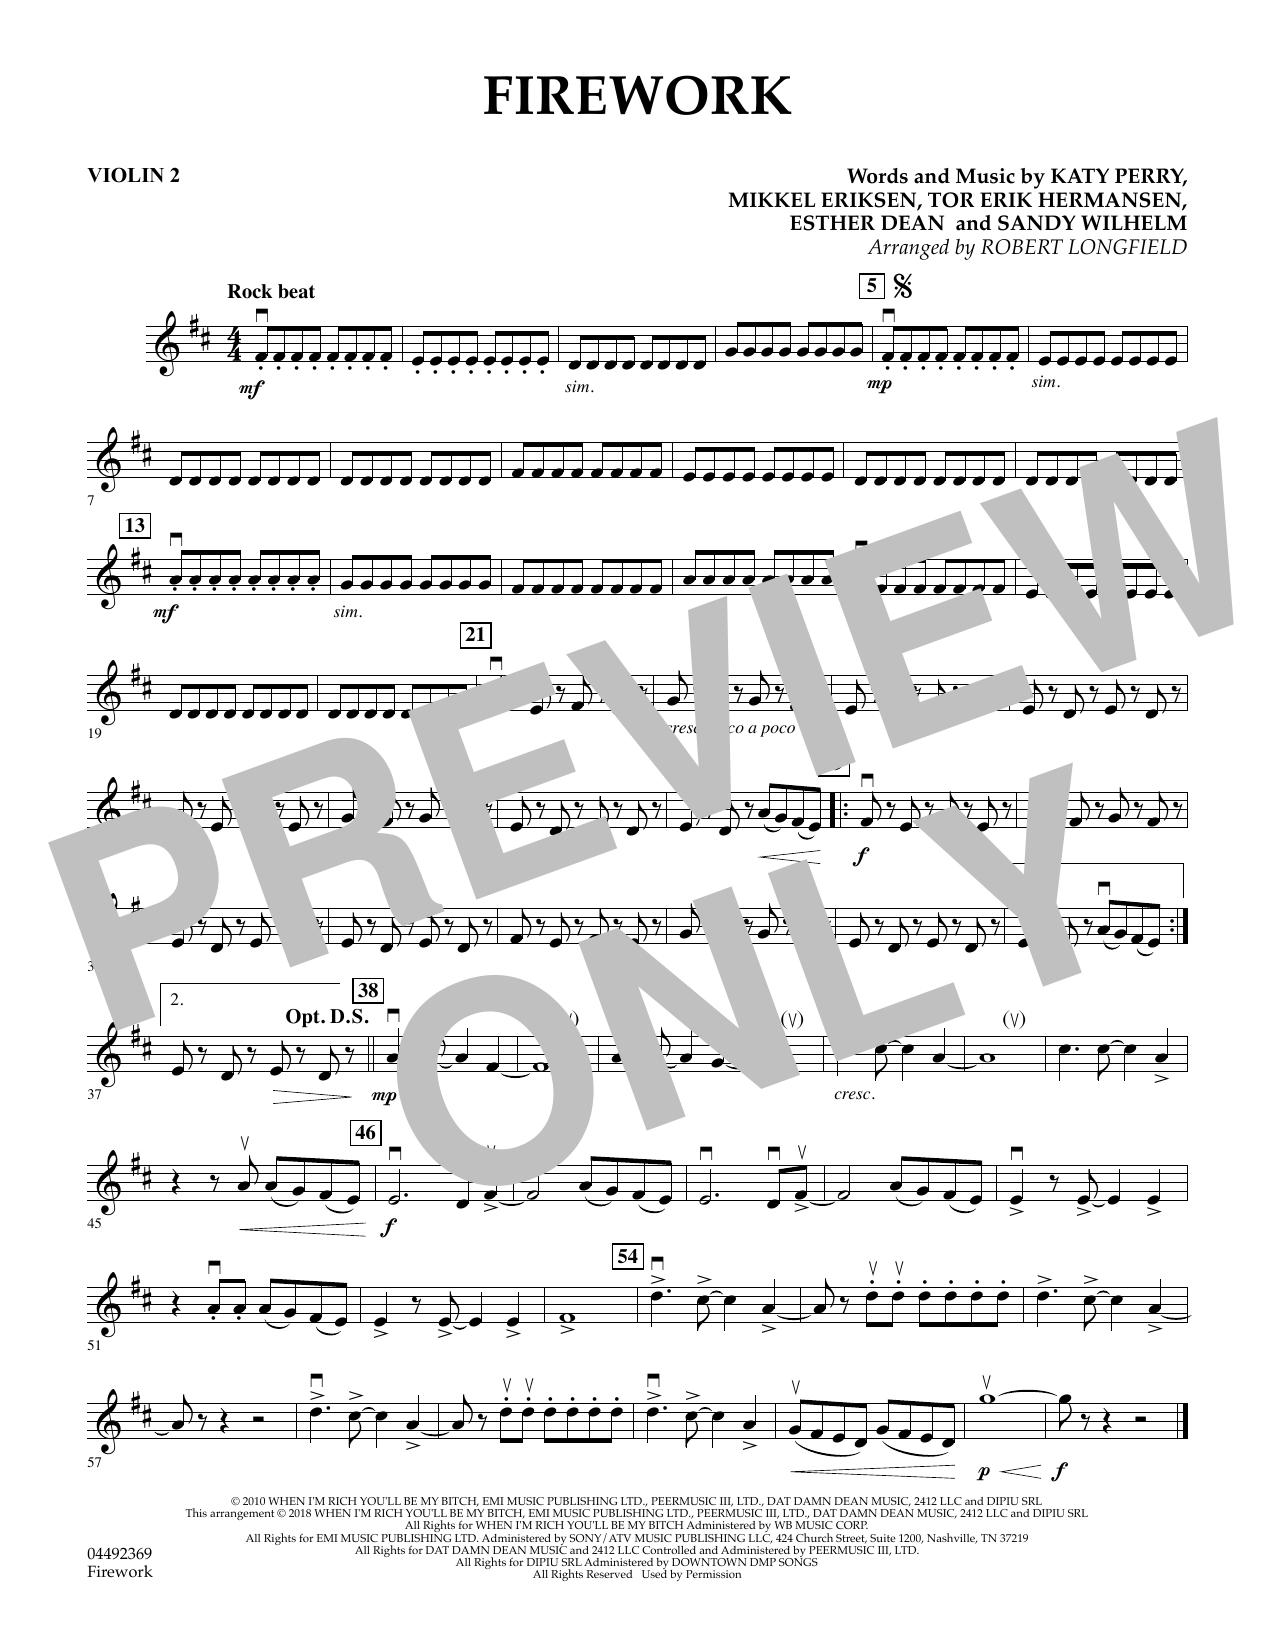 Firework (arr. Robert Longfield) - Violin 2 (Orchestra)